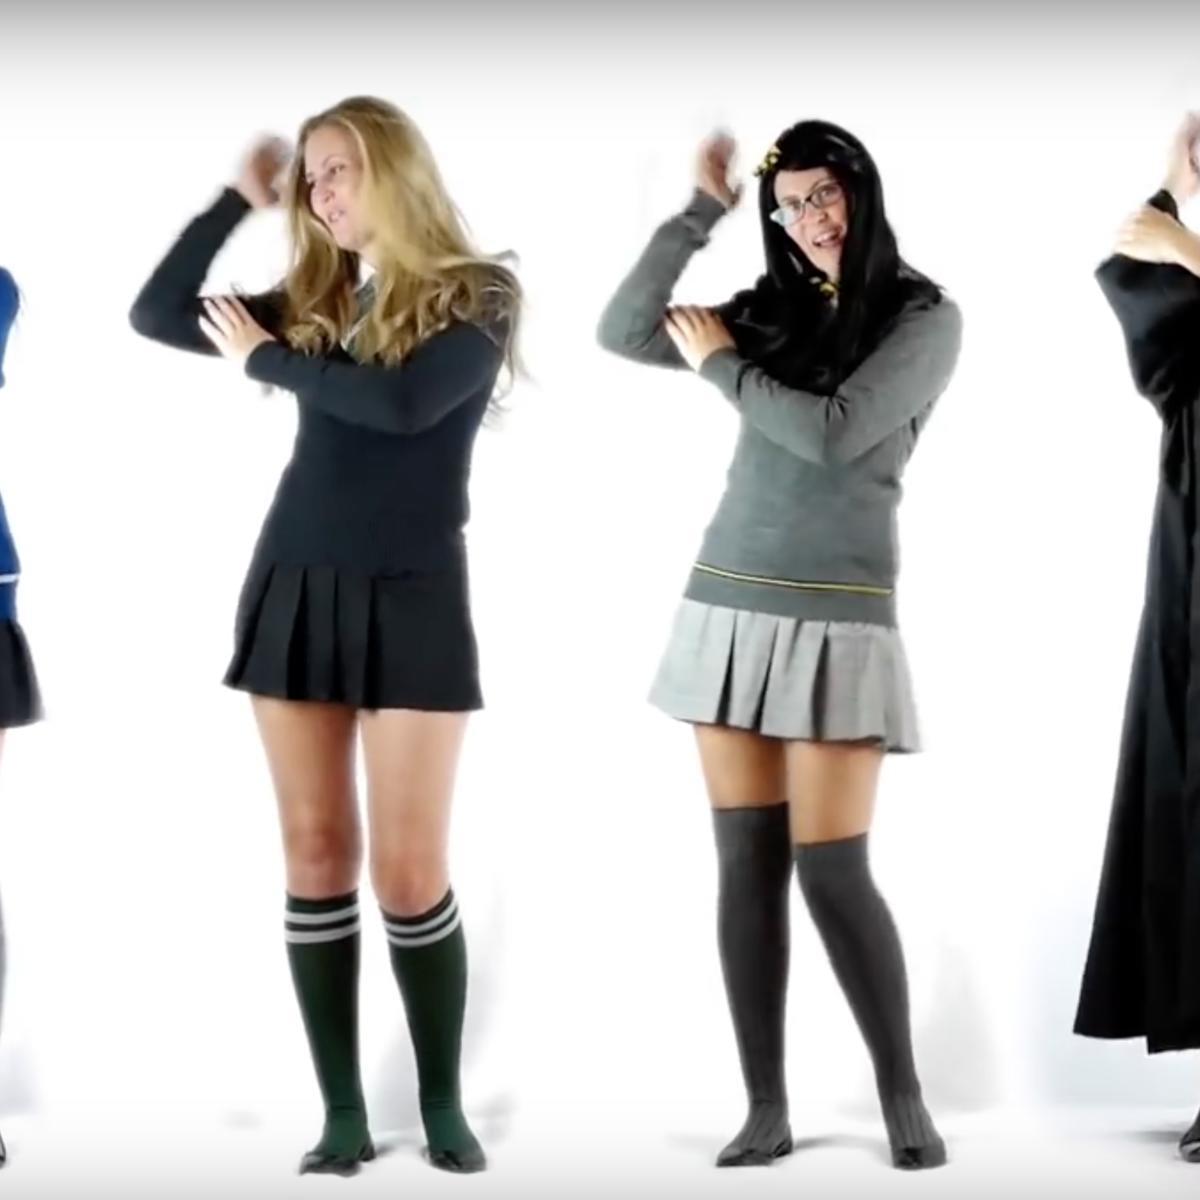 Harry Potter parody music video